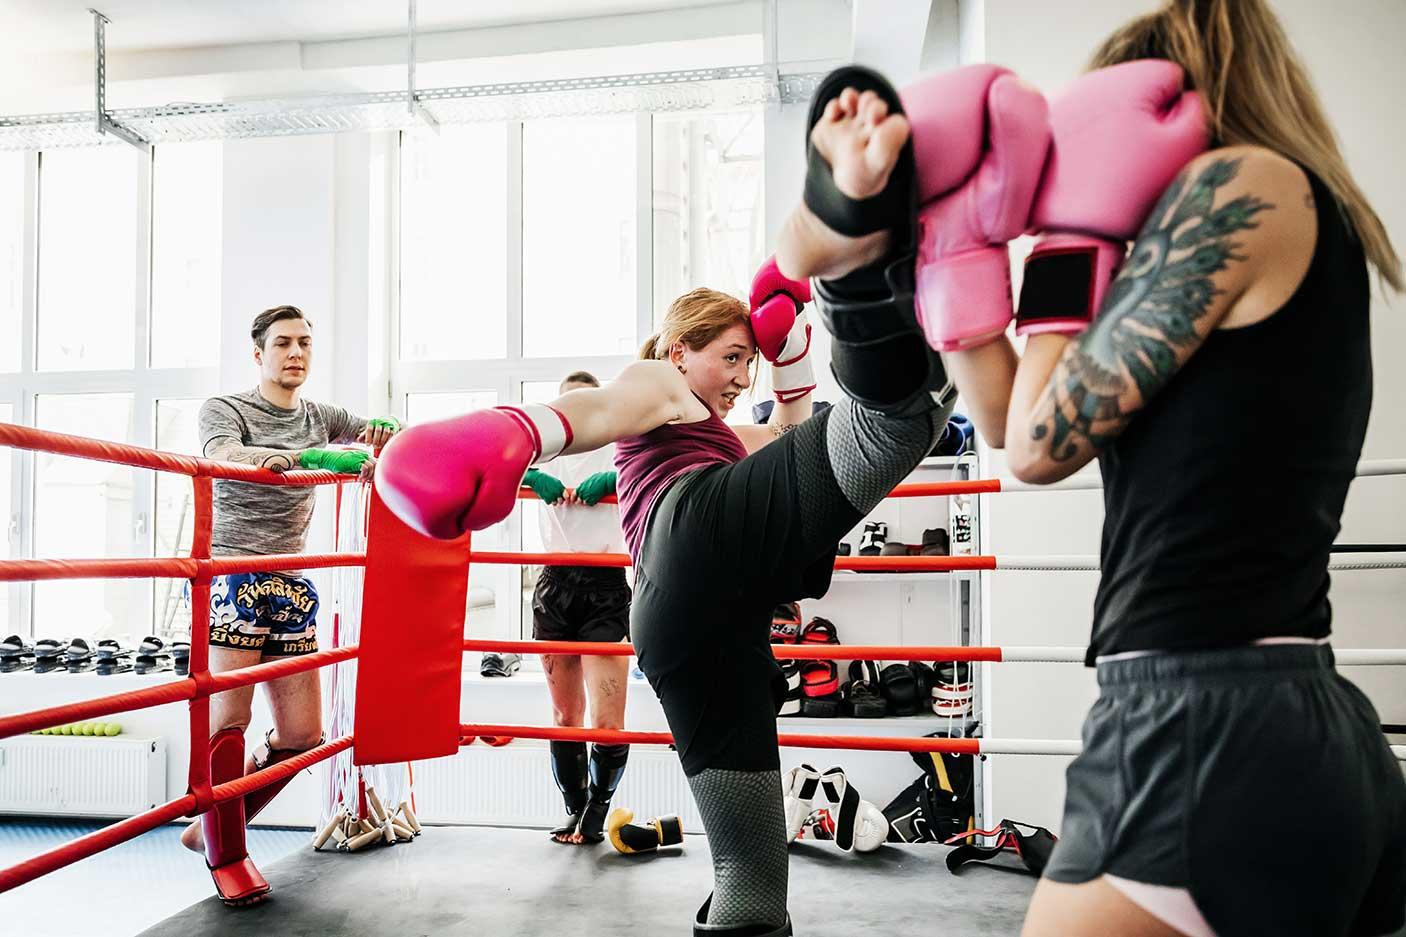 Women sparring at Thai Boxing gym